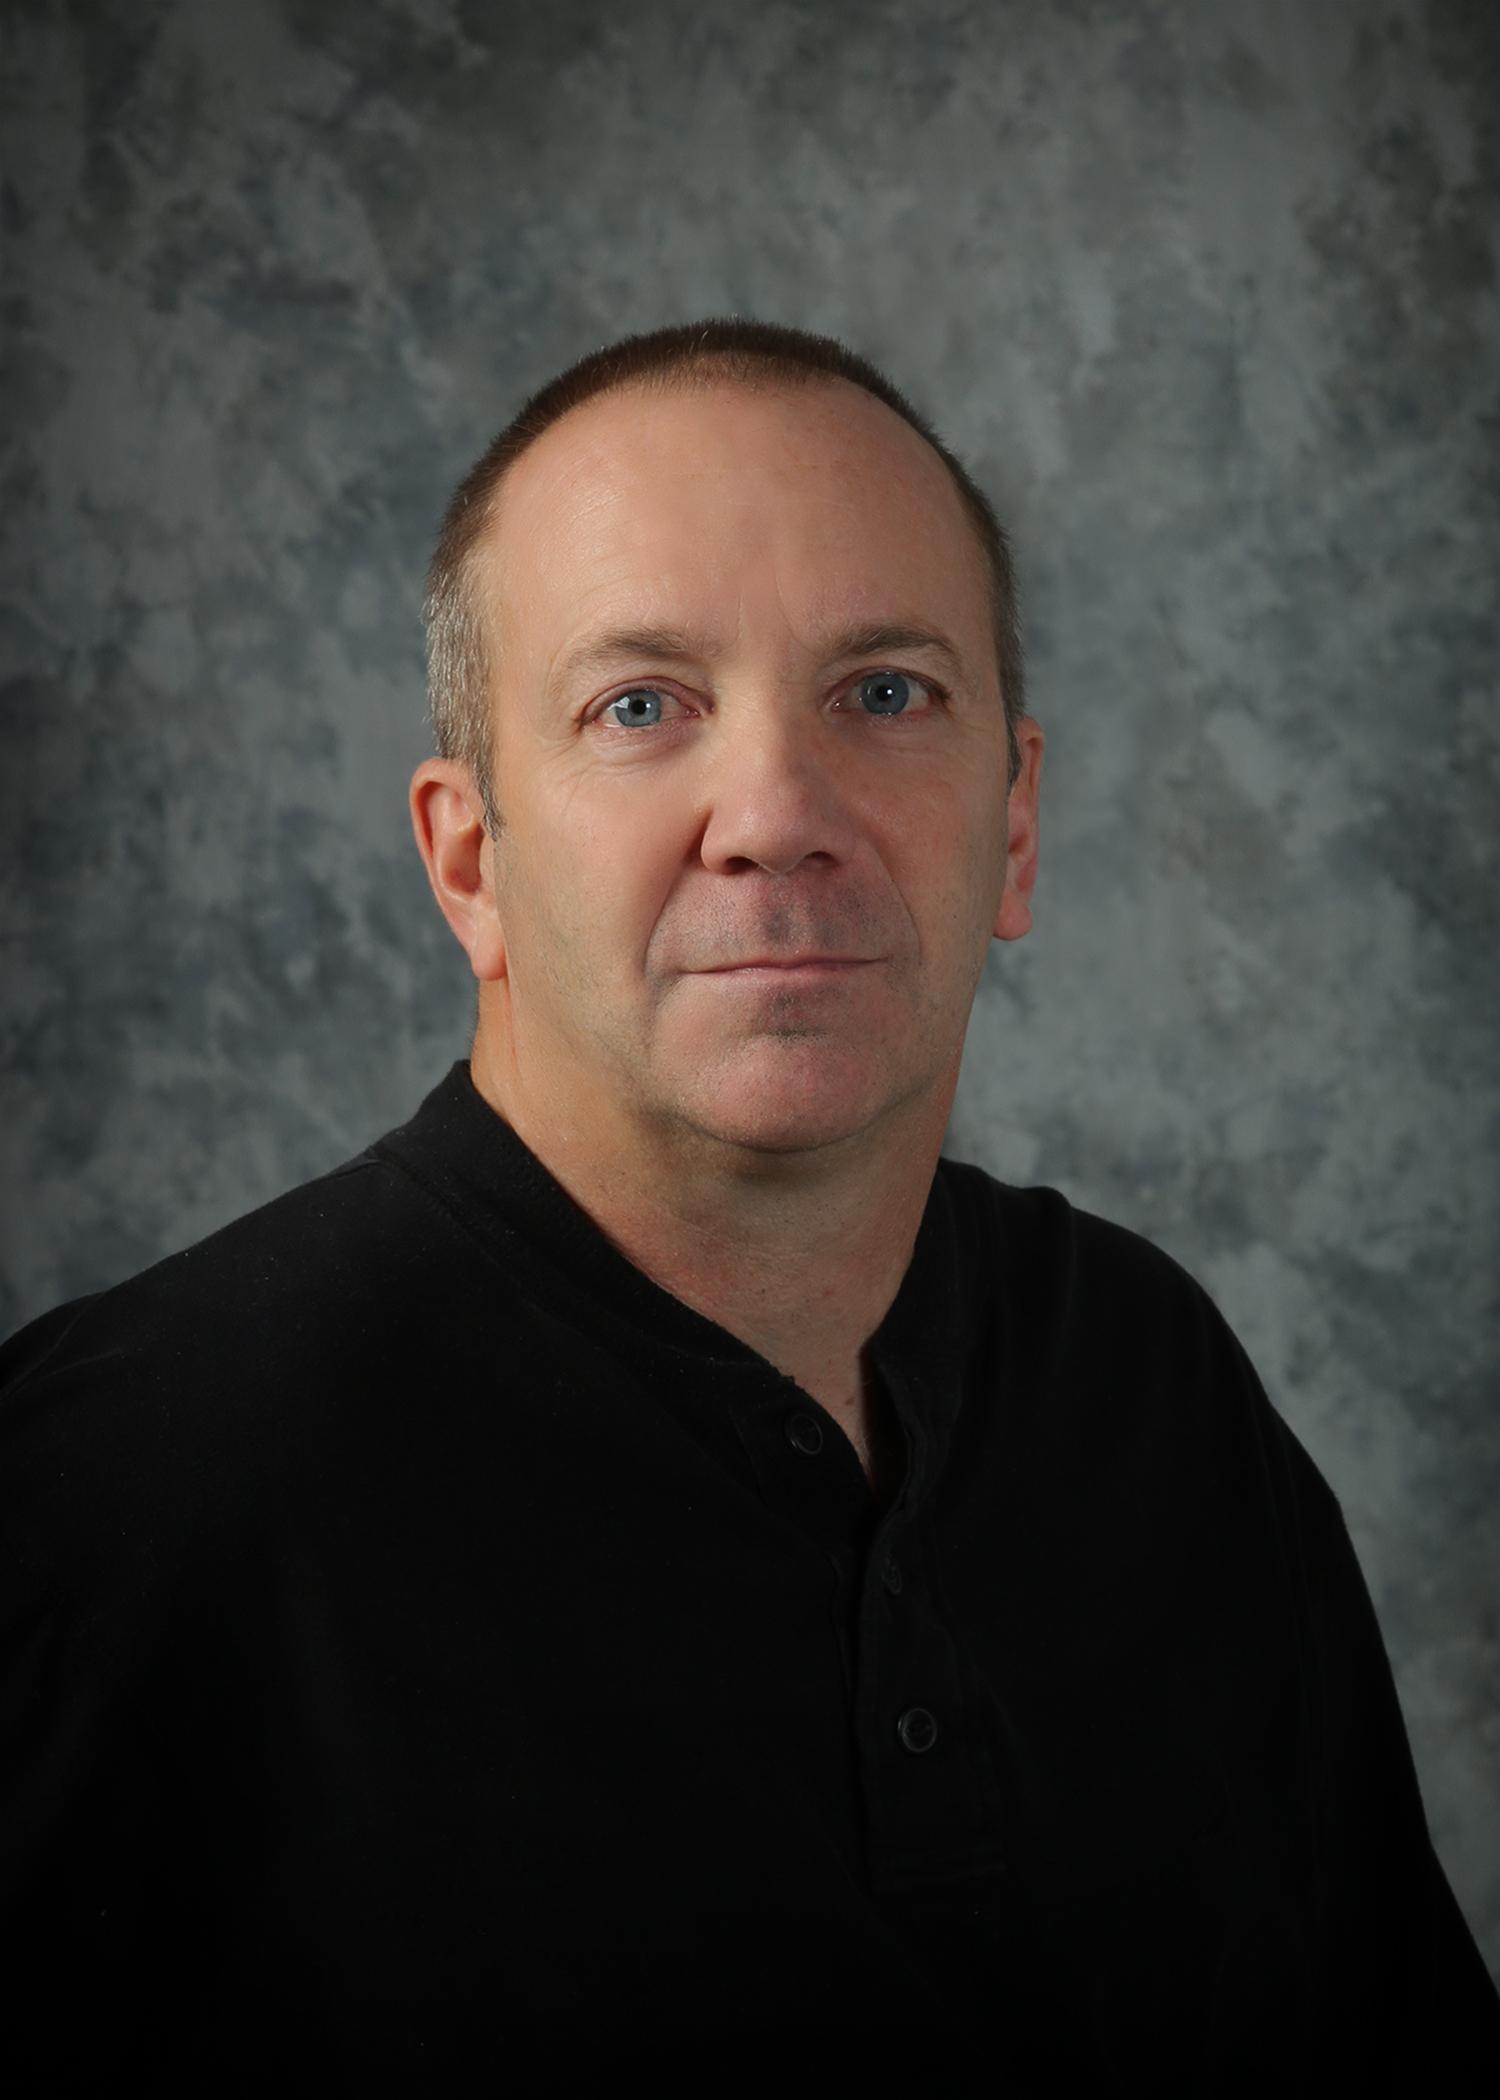 Doug Schlough - At Large Representative  (715)267-6205  council02@greenwoodwi.com  First Elected: 2015  Current Term: 2019-2021